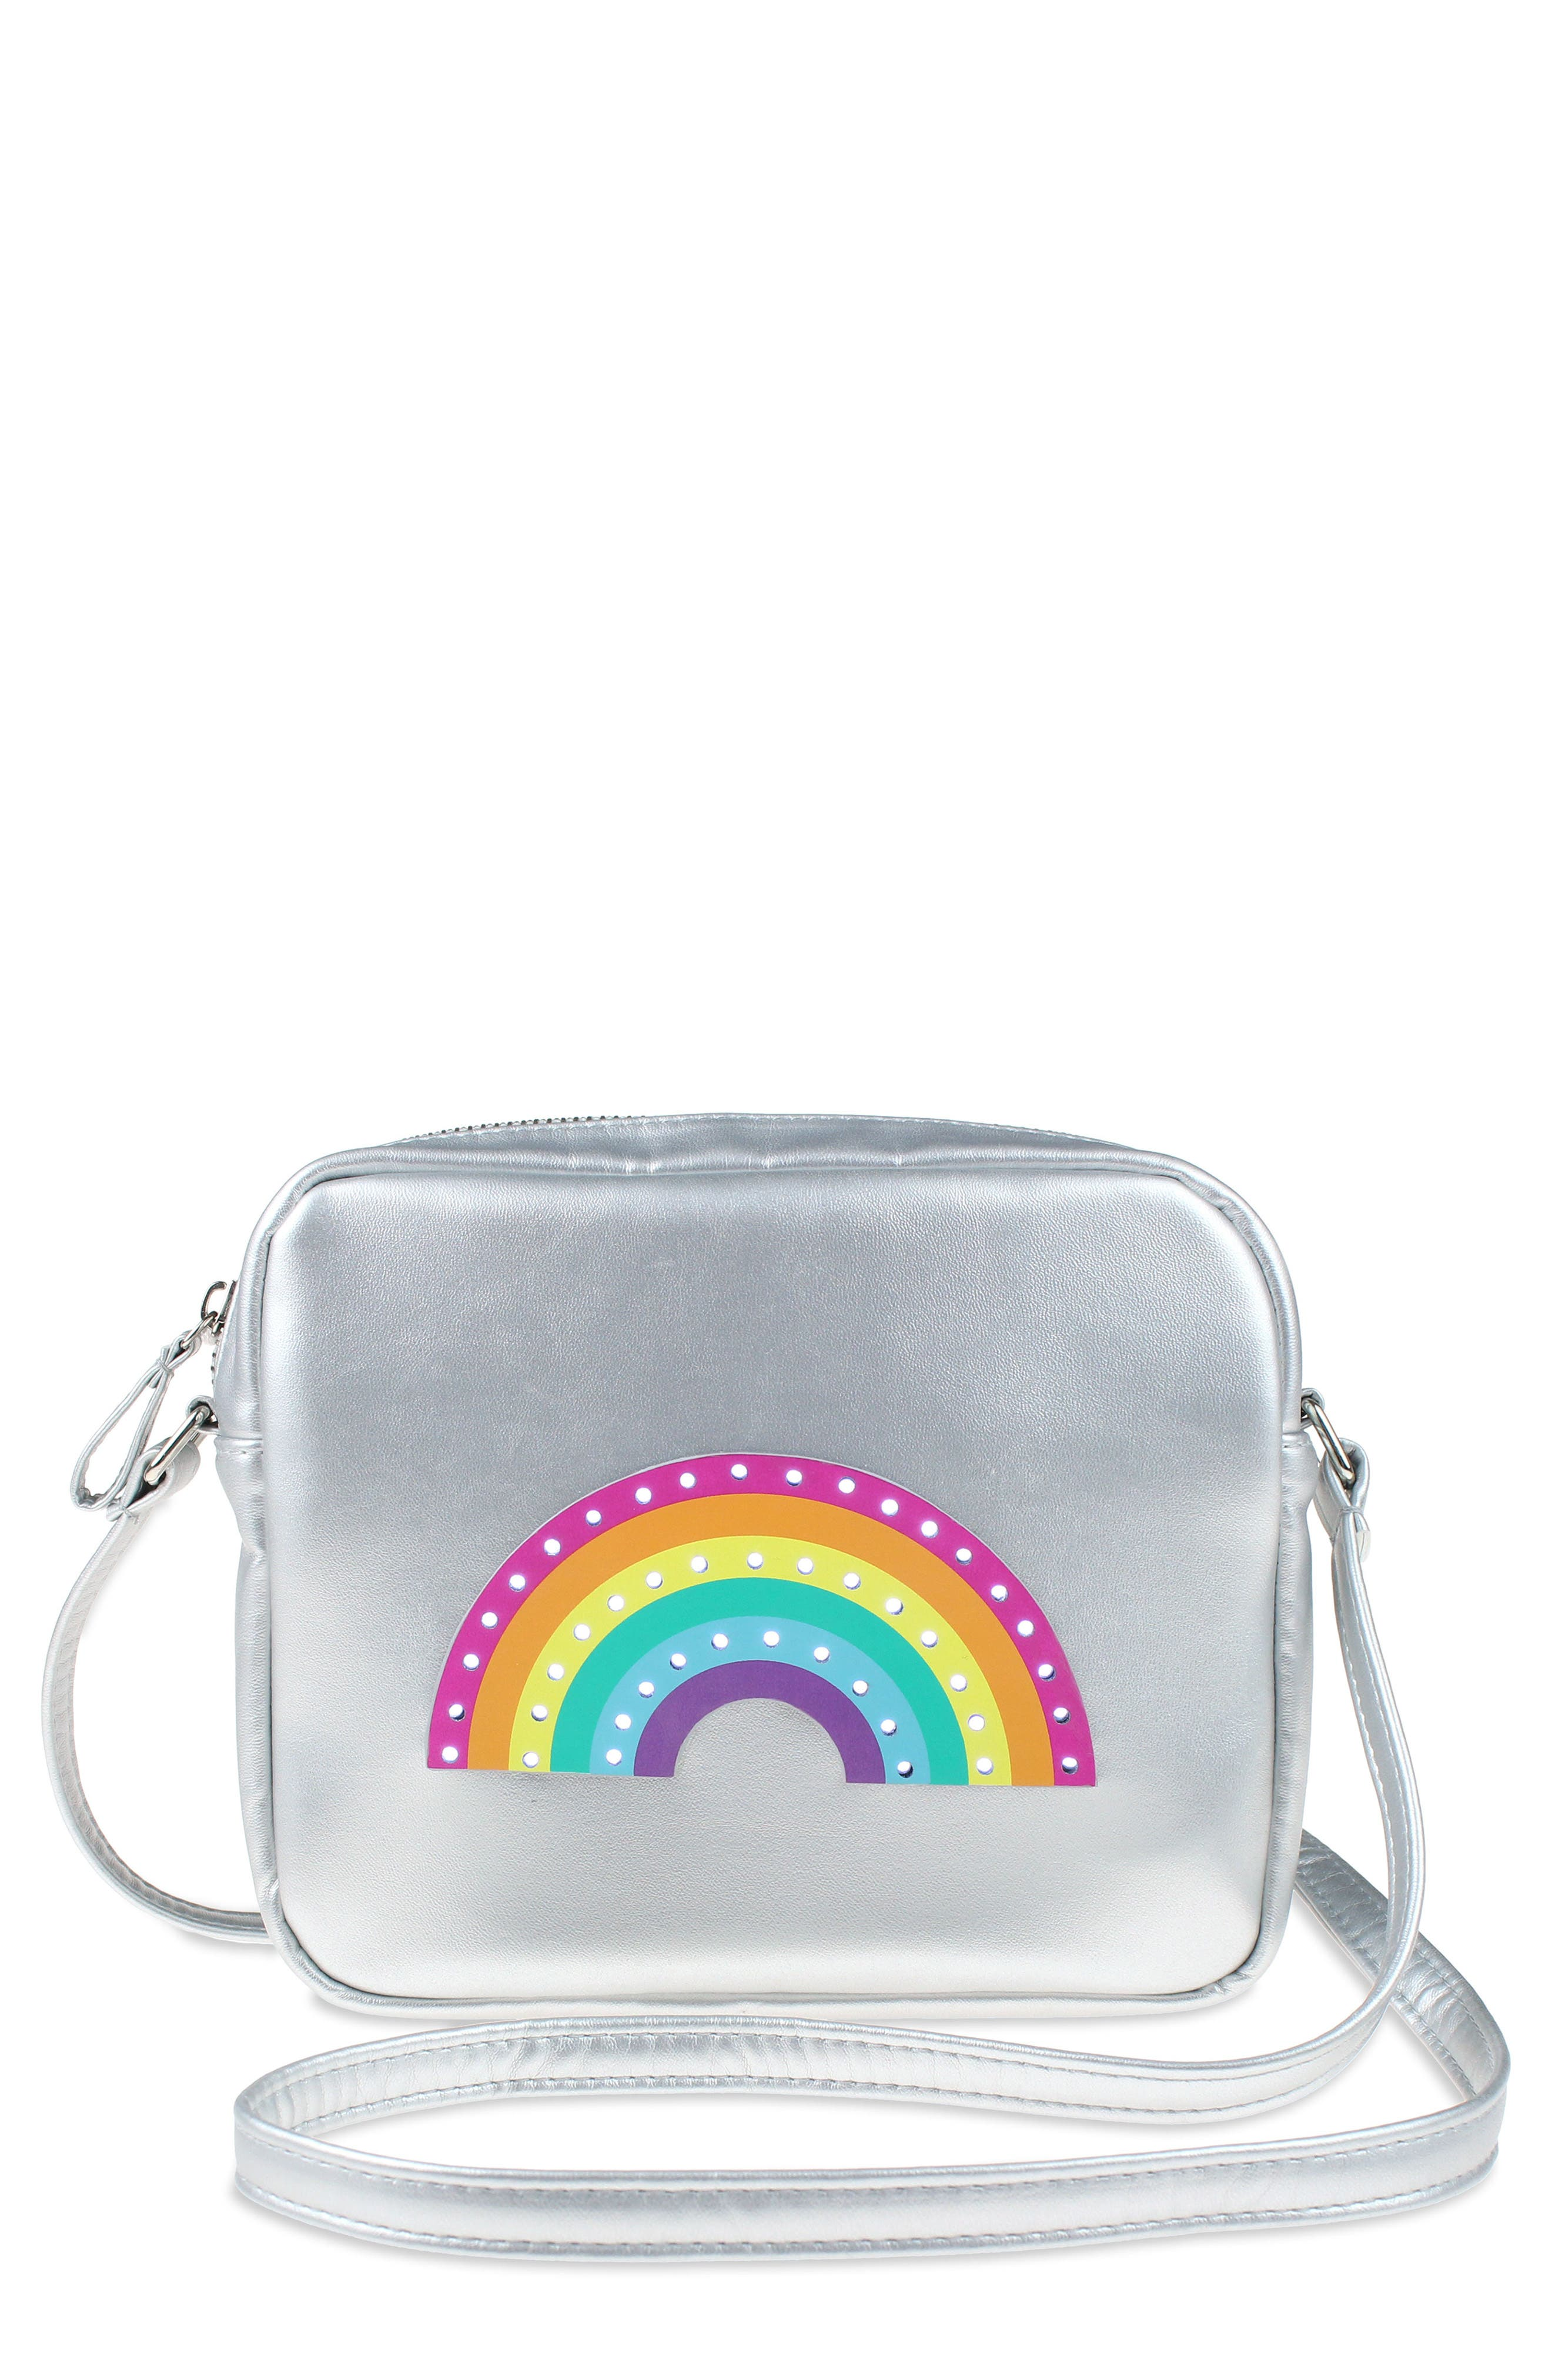 Capelli LED Light-Up Rainbow Faux Leather Crossbody Bag,                         Main,                         color,